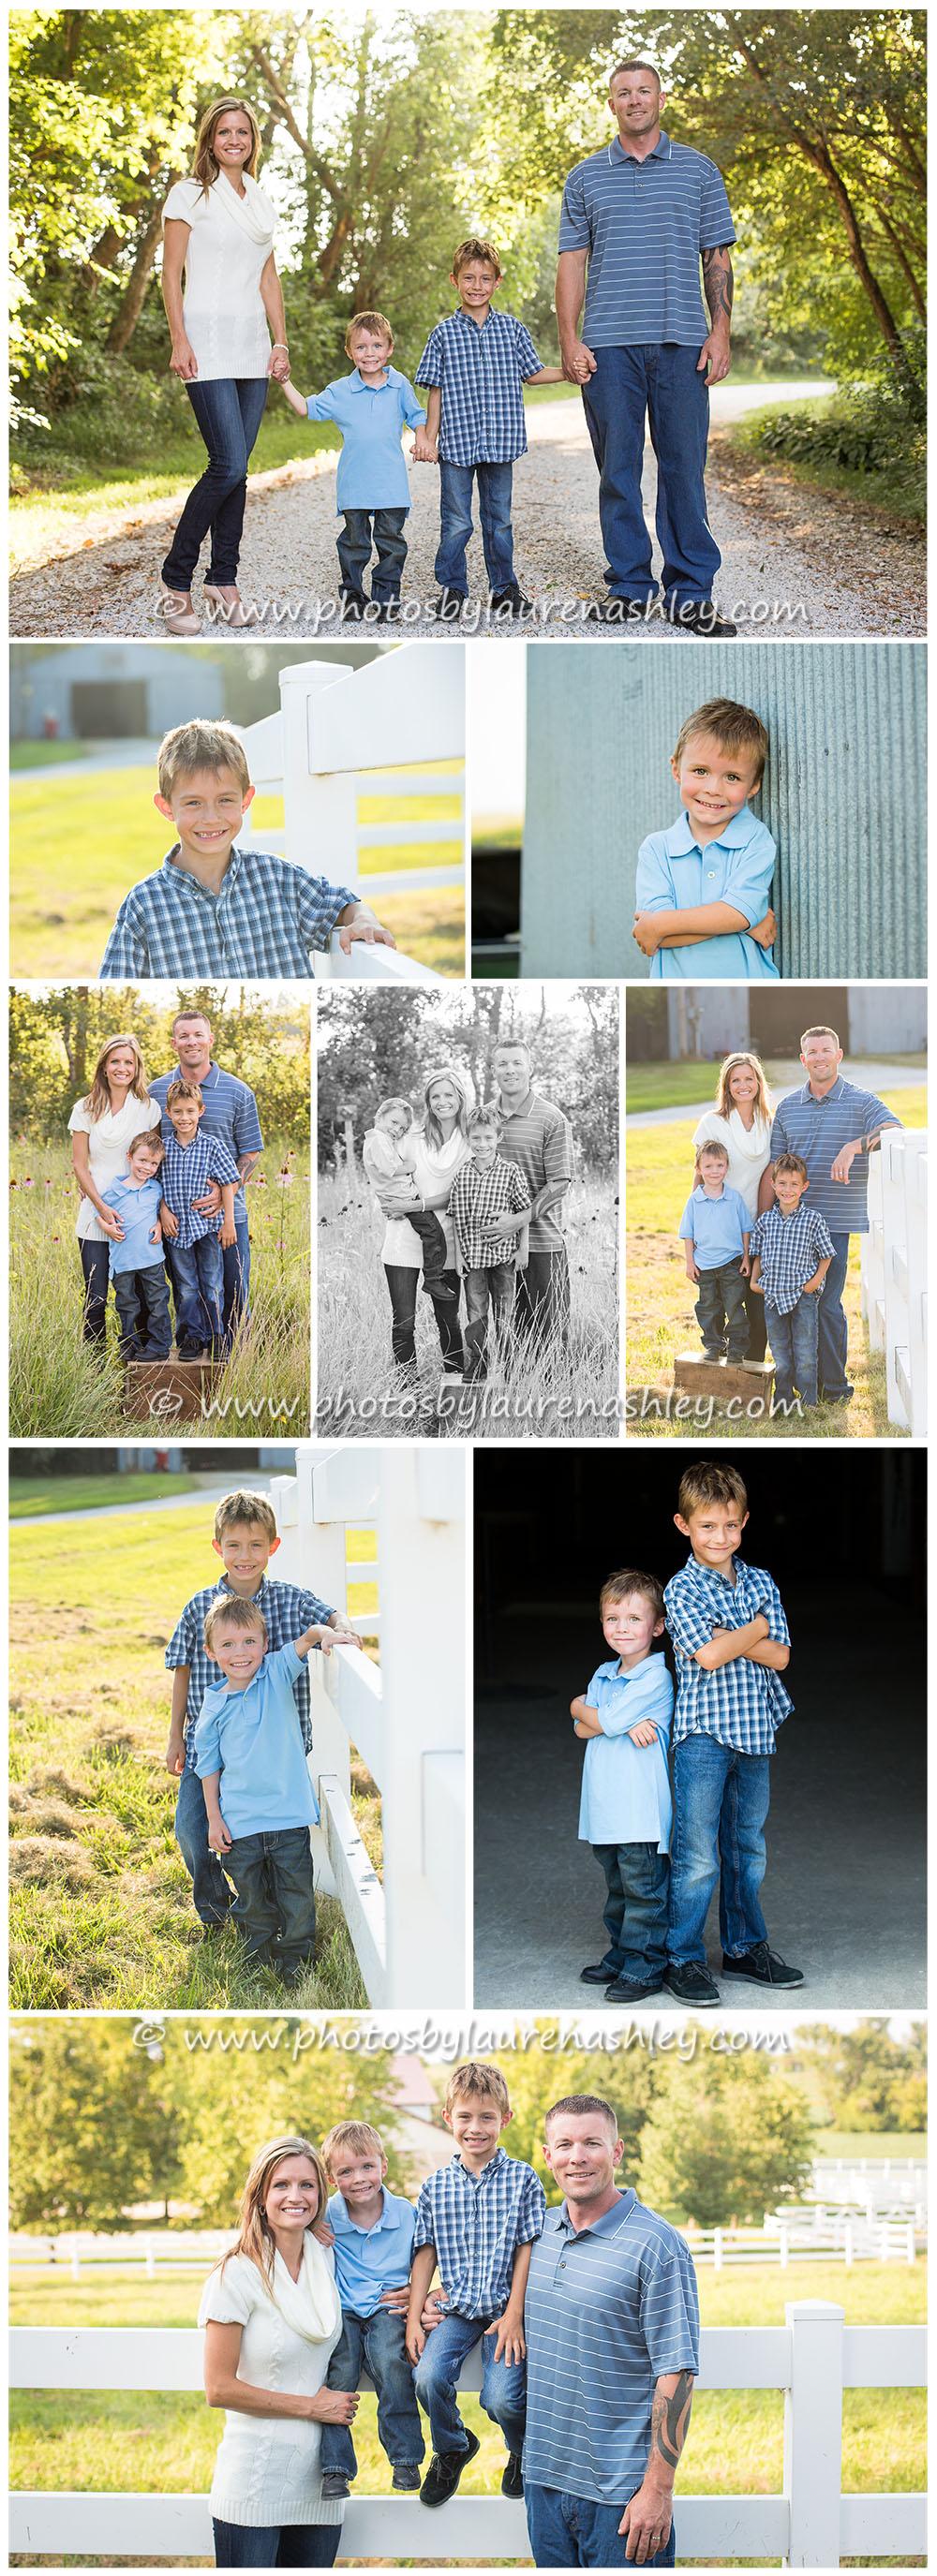 Family photography blog board